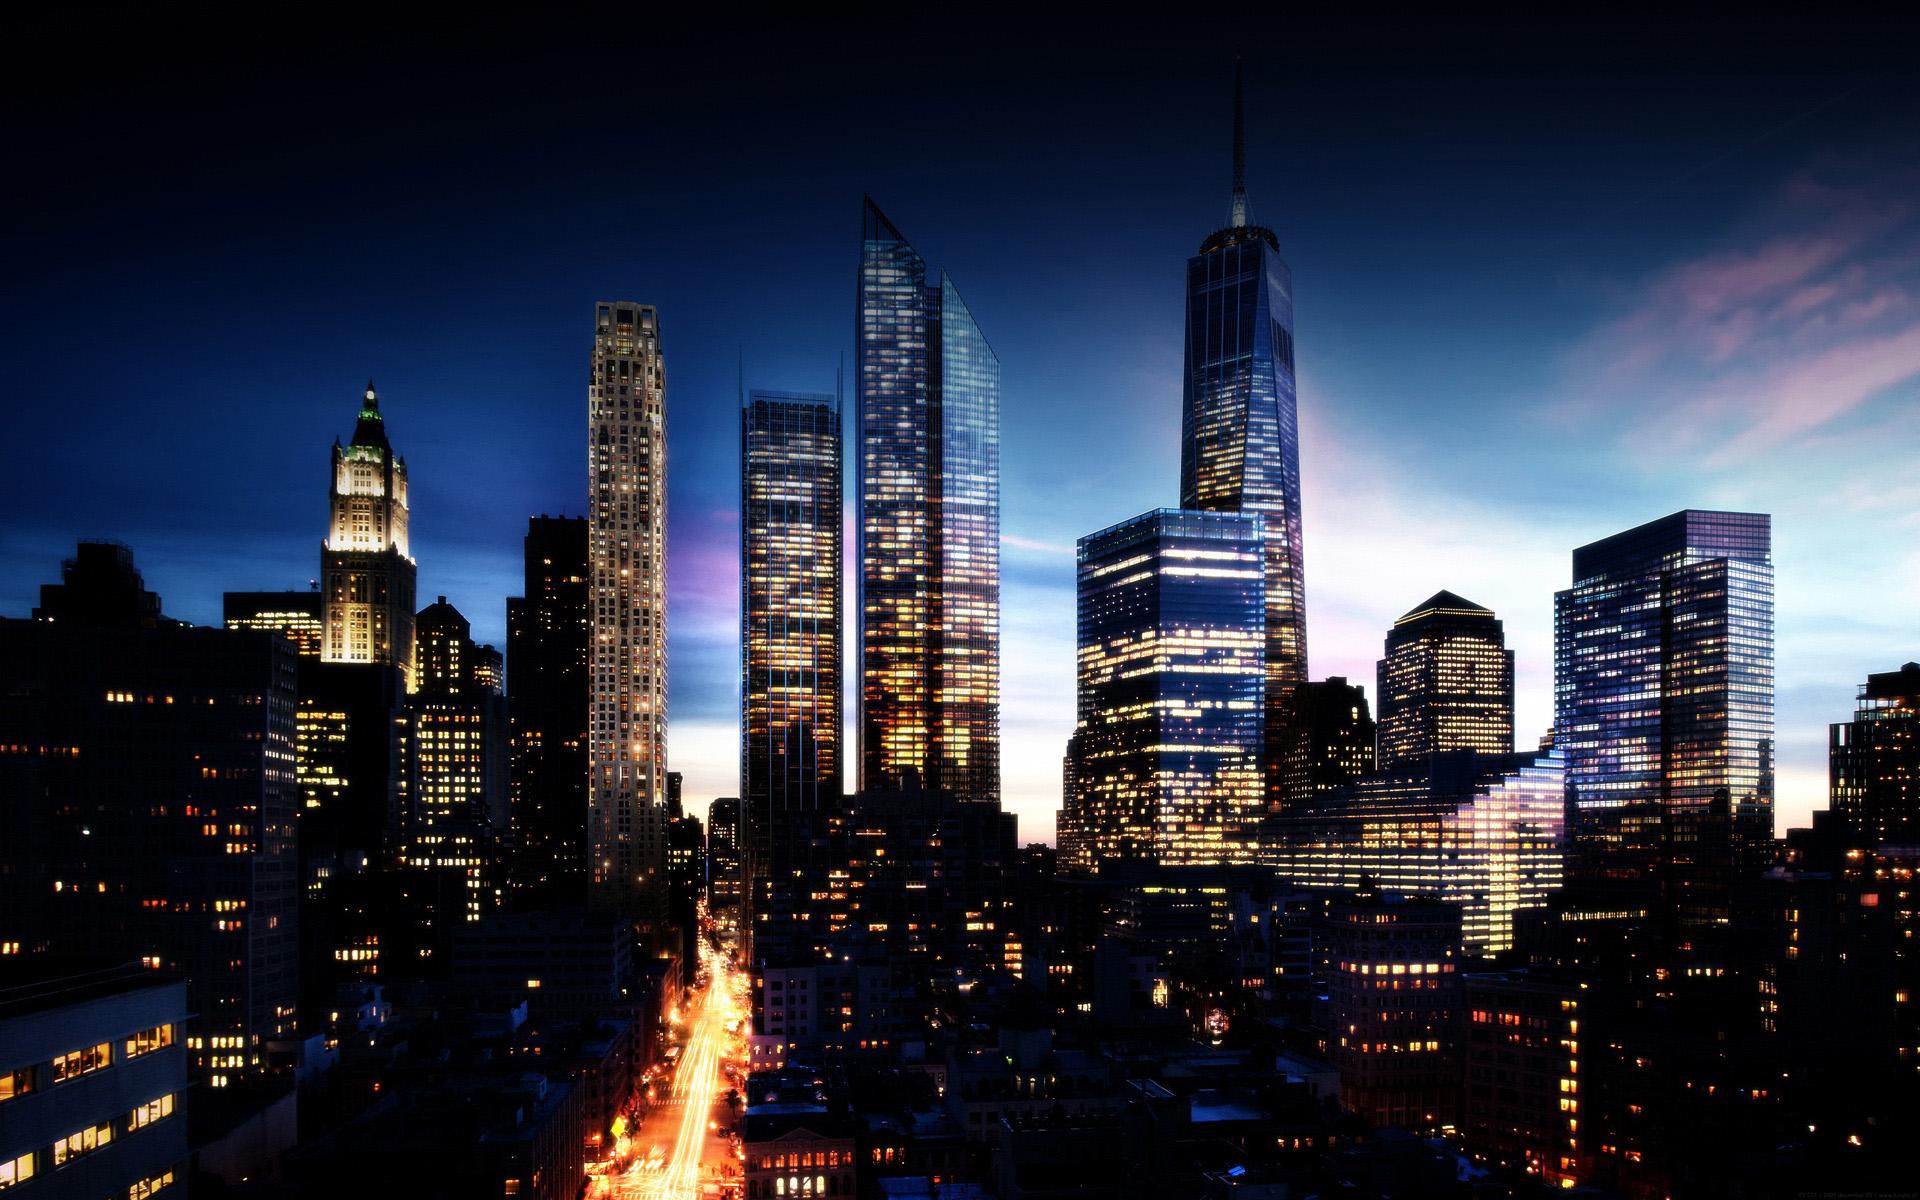 New York At Night Wallpaper 1920x1200